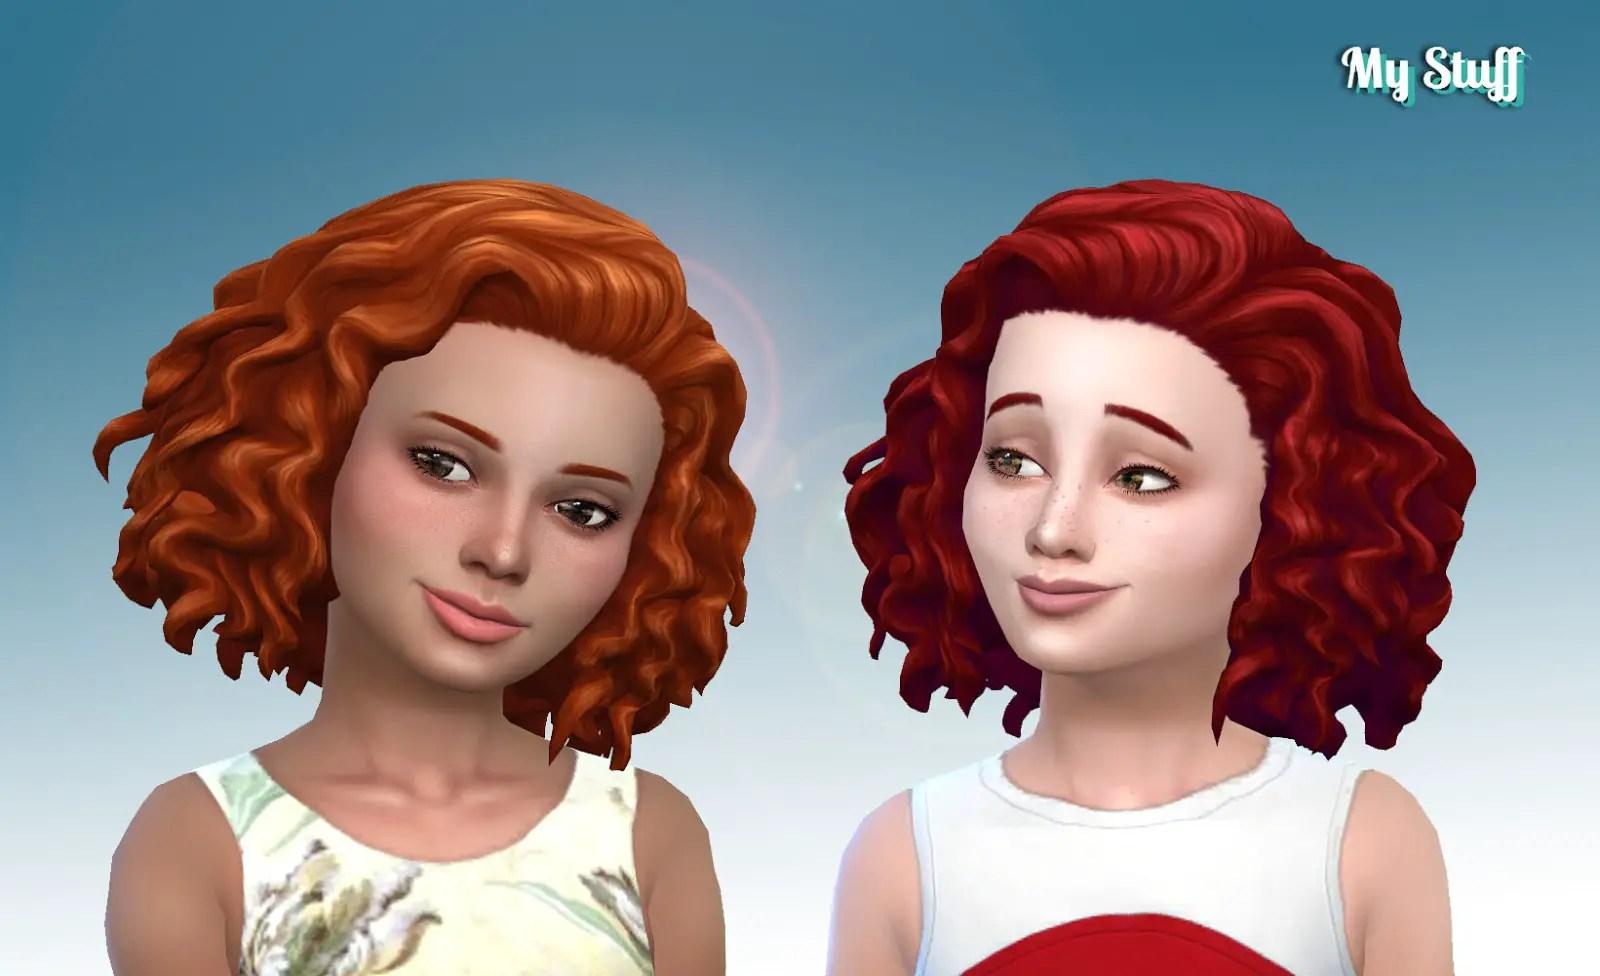 Sims 4 Hairs Mystufforigin Medium Mid Curly Hair For Girls